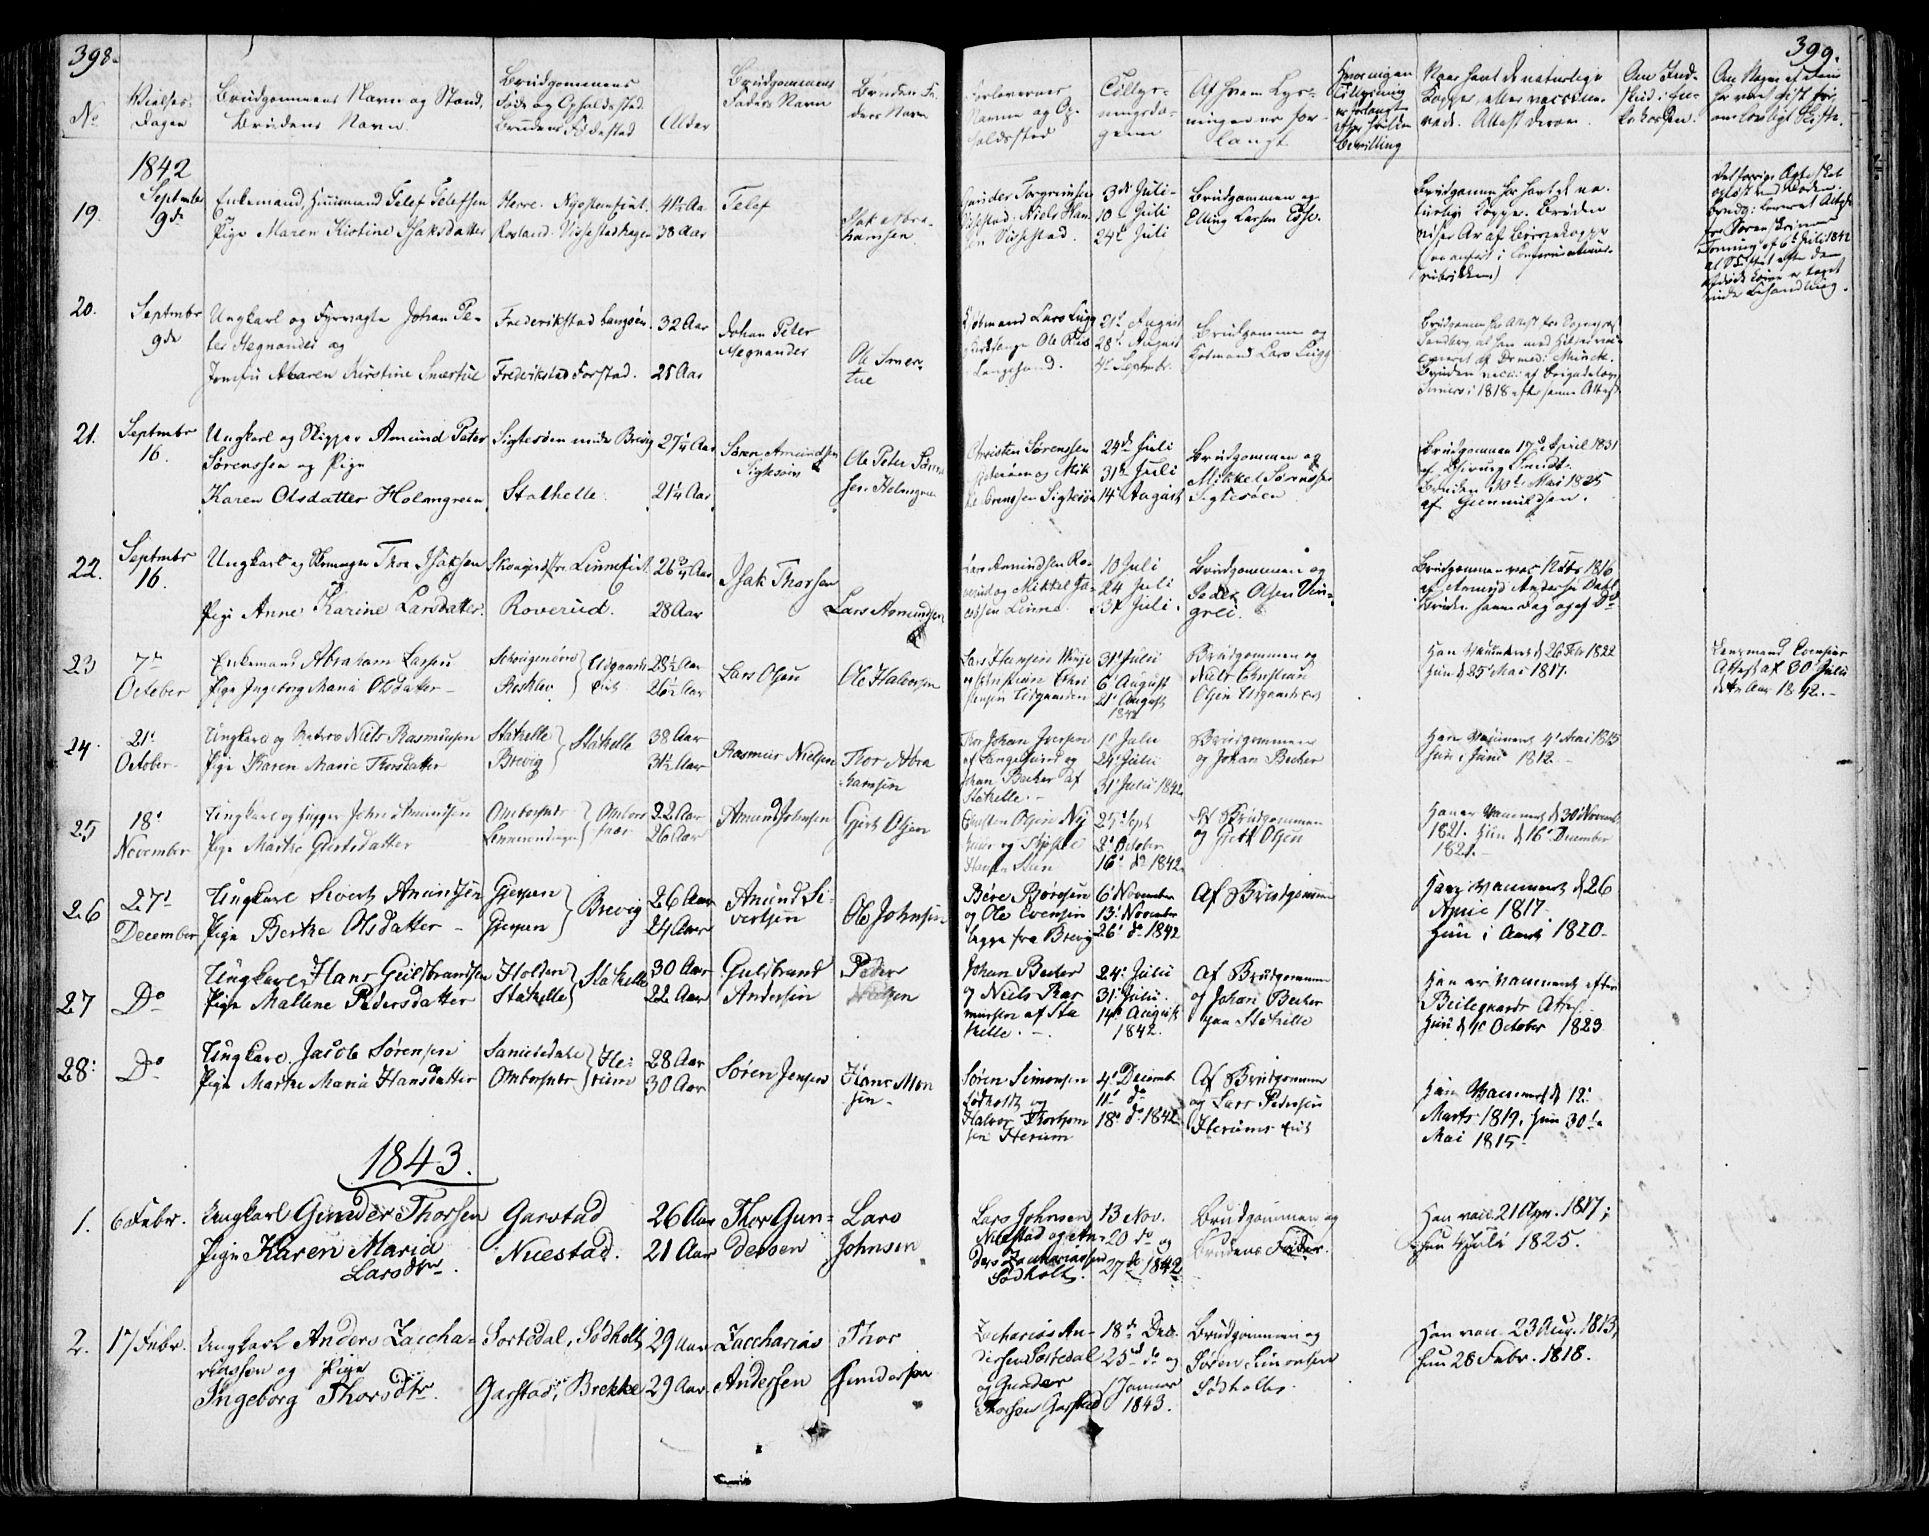 SAKO, Bamble kirkebøker, F/Fa/L0004: Ministerialbok nr. I 4, 1834-1853, s. 398-399